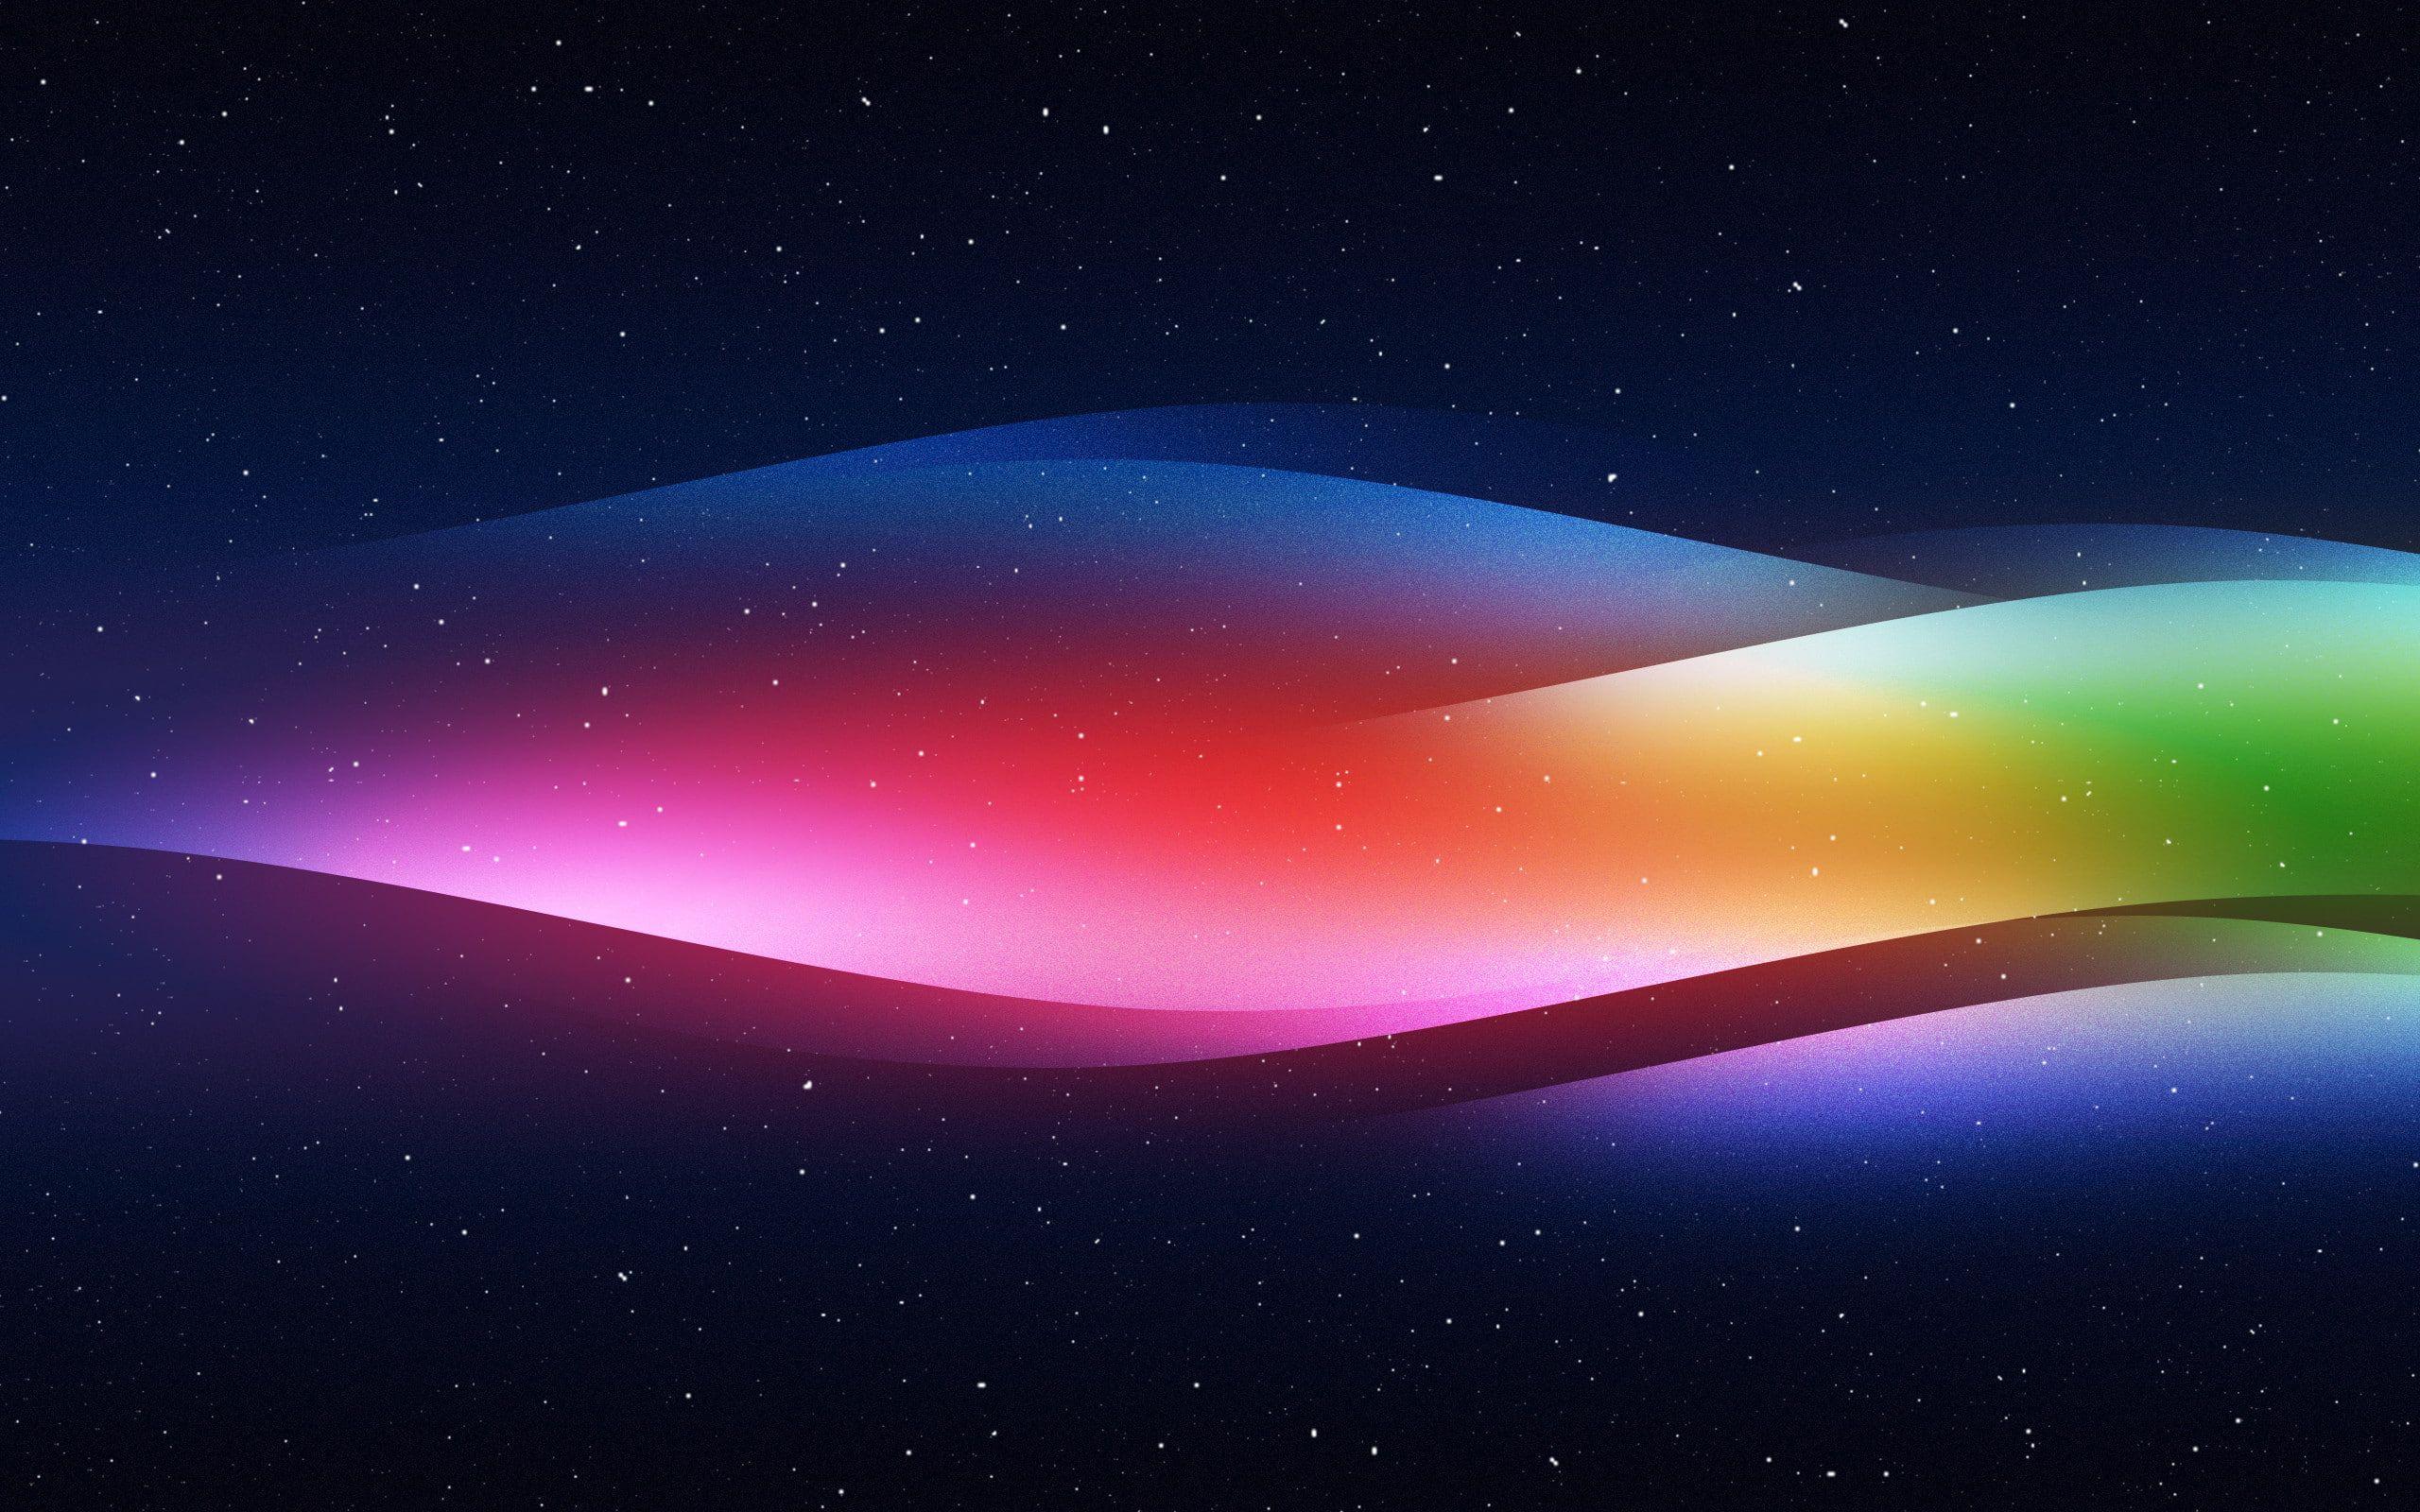 Spectrum 4k 8k Hd Colorful 2k Wallpaper Hdwallpaper Desktop Hd Wallpaper Hd Wallpaper Desktop Horror Wallpapers Hd